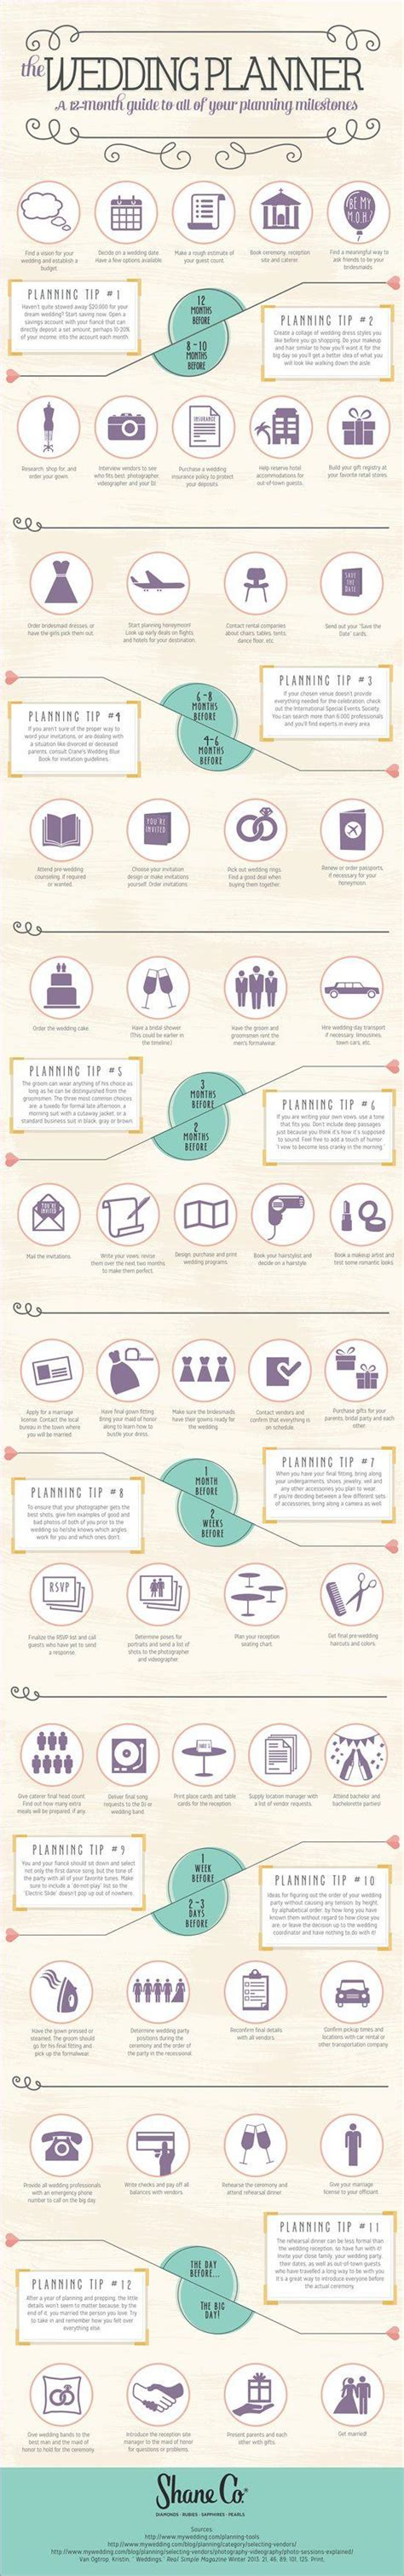 The Best Wedding Planner Best Wedding Planning Advice From The Pros Modwedding